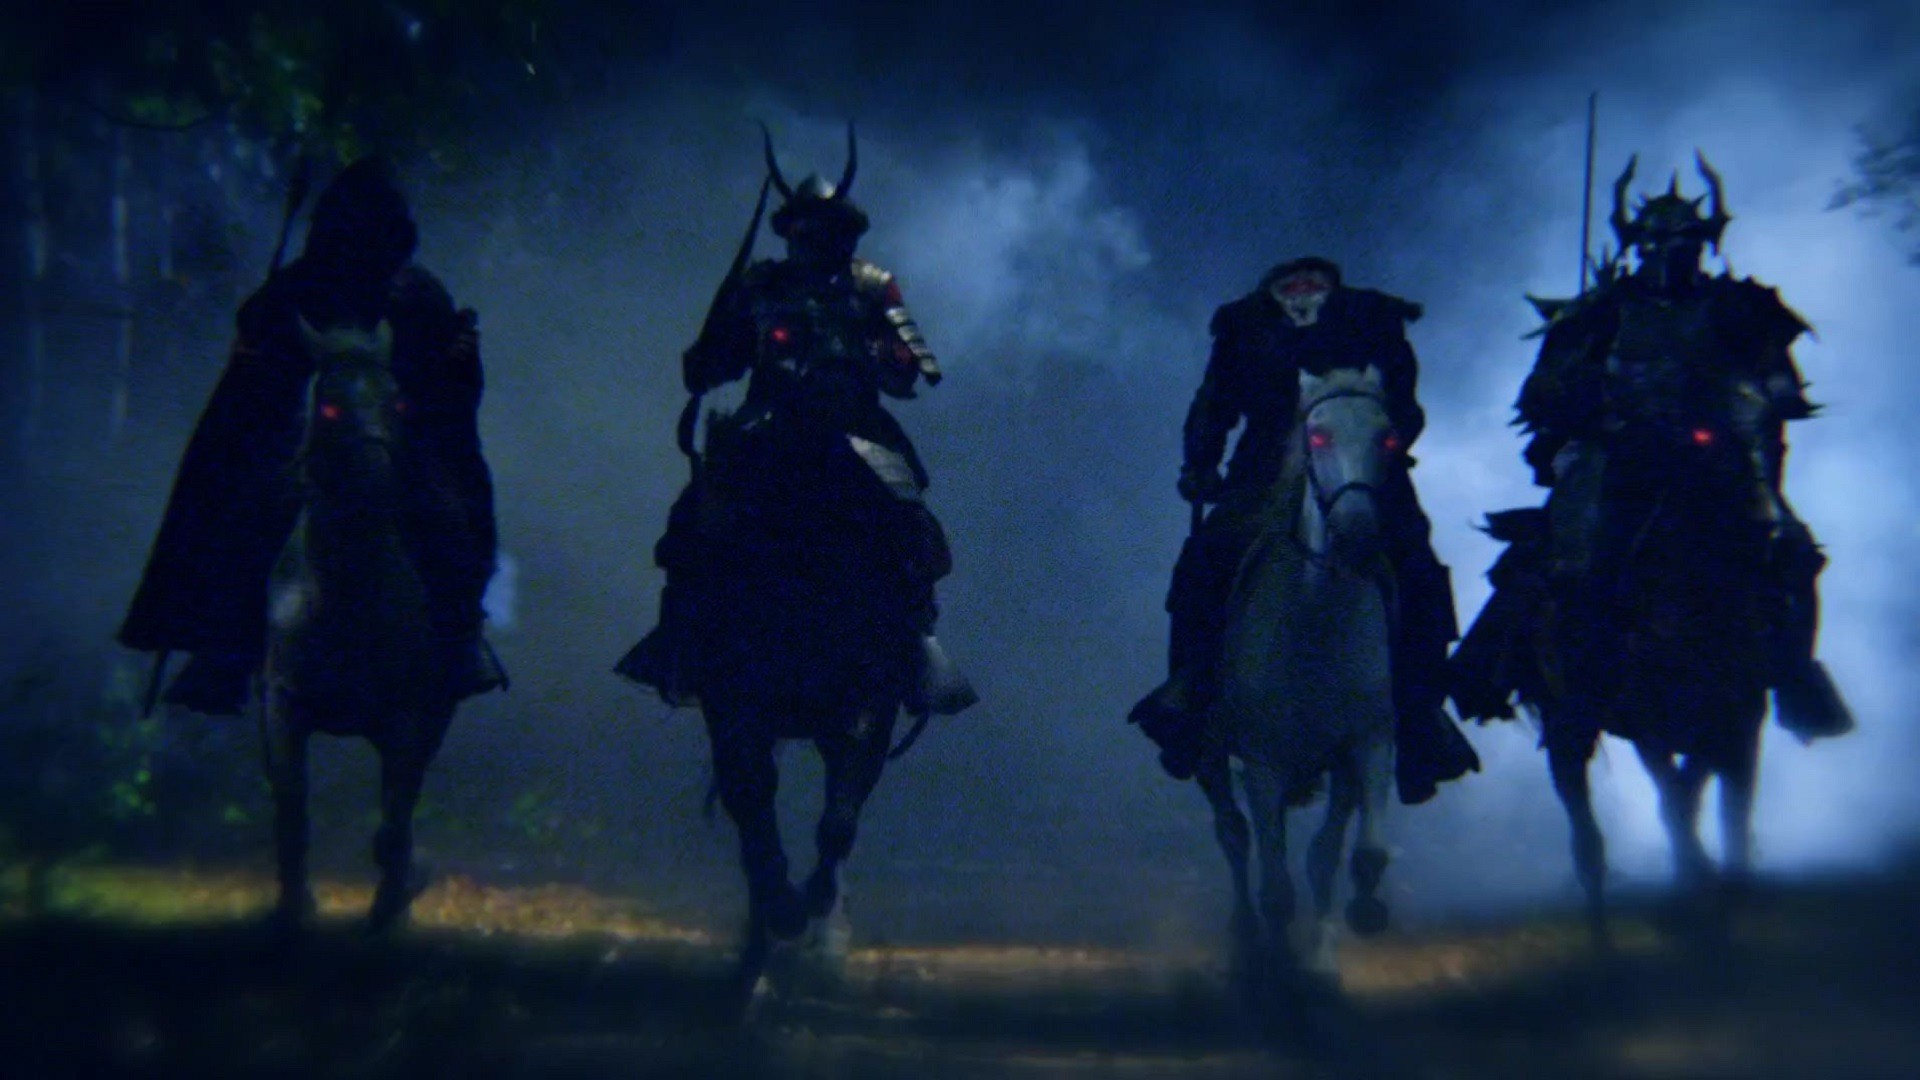 Four Horsemen Of The Apocalypse Wallpaper 74 Images